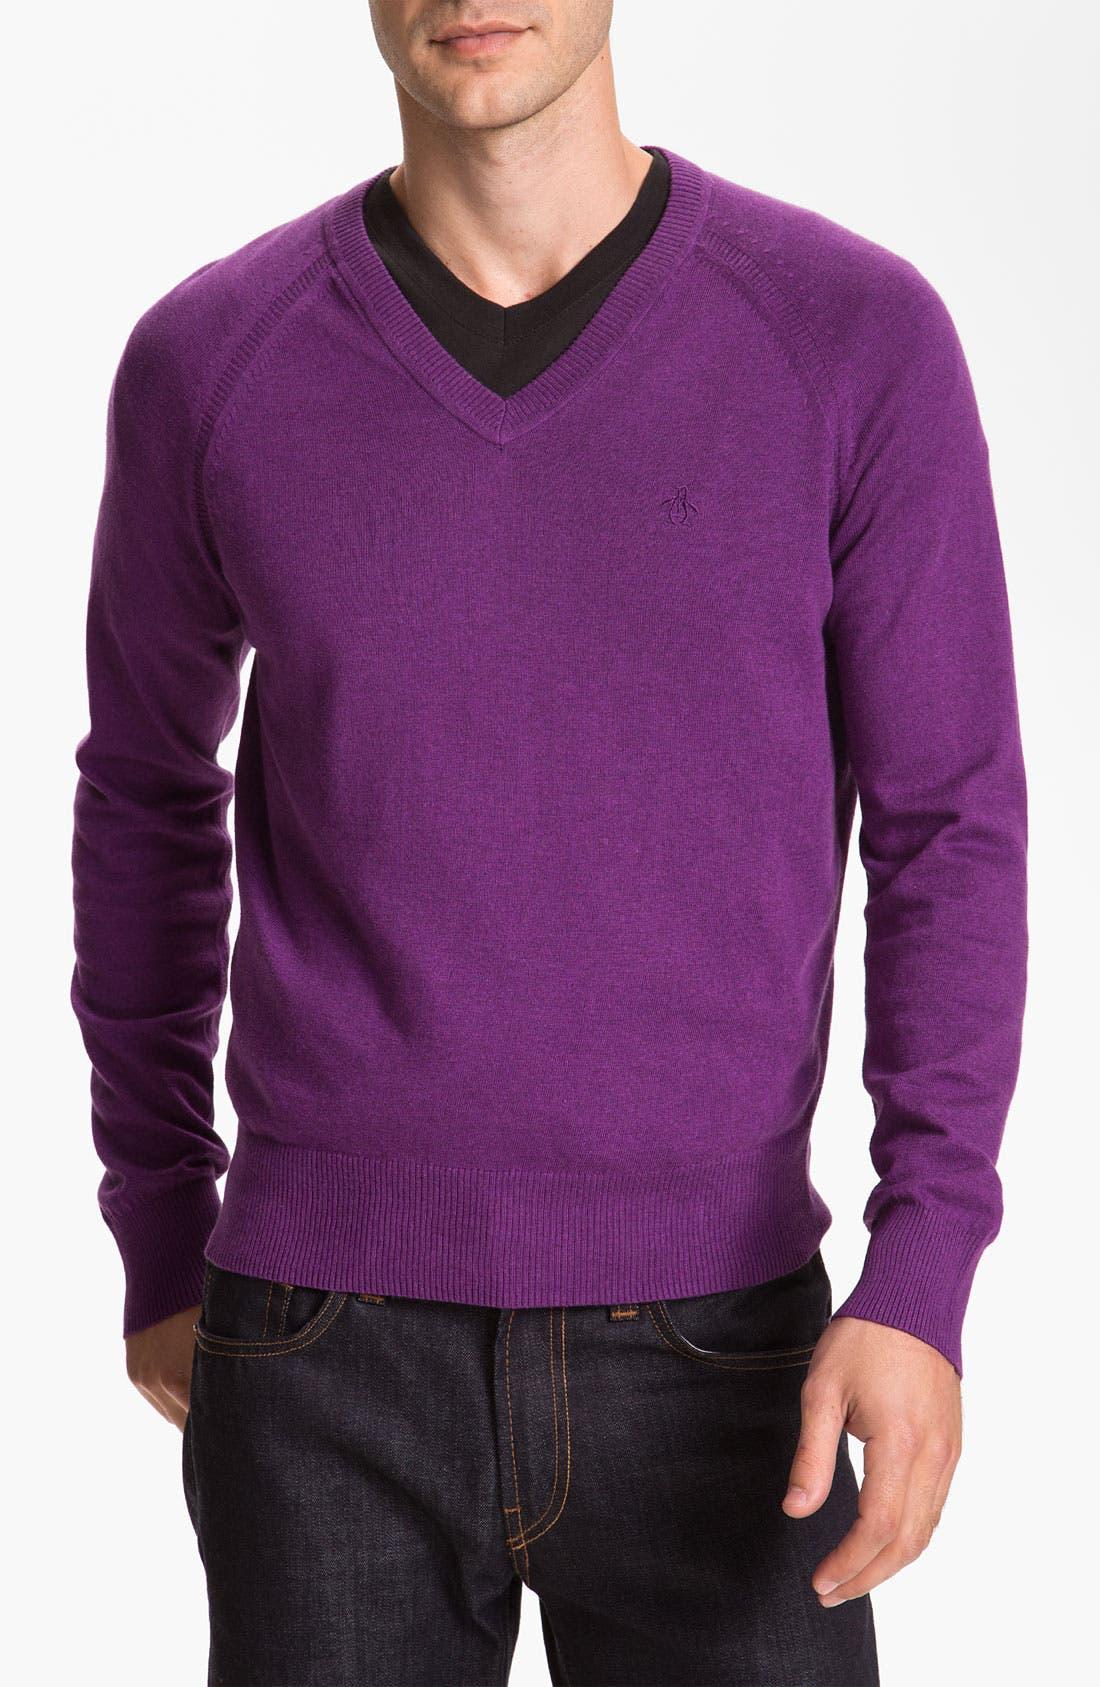 Main Image - Original Penguin Pima Cotton V-Neck Sweater